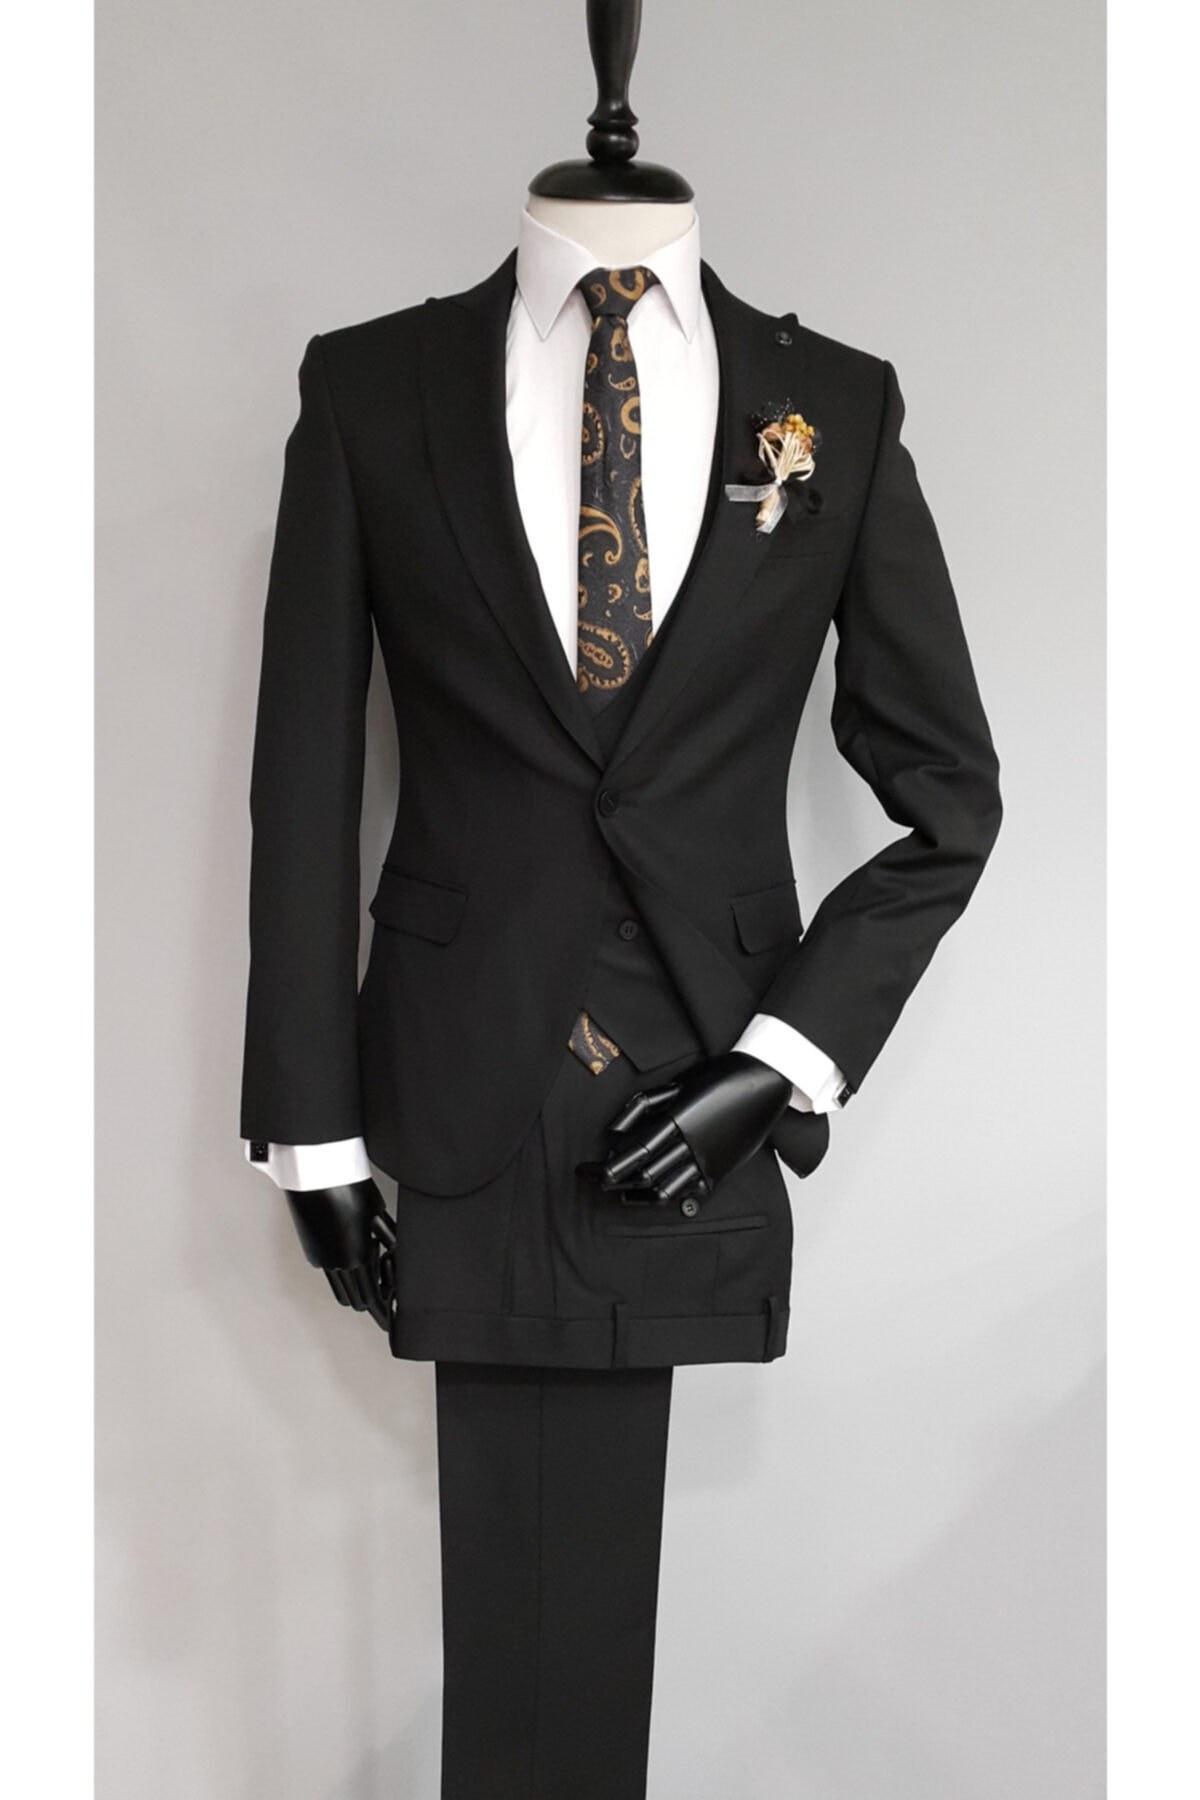 تصویر خرید کت شلوار غیرحضوری برند BAGGI رنگ مشکی کد ty66394647